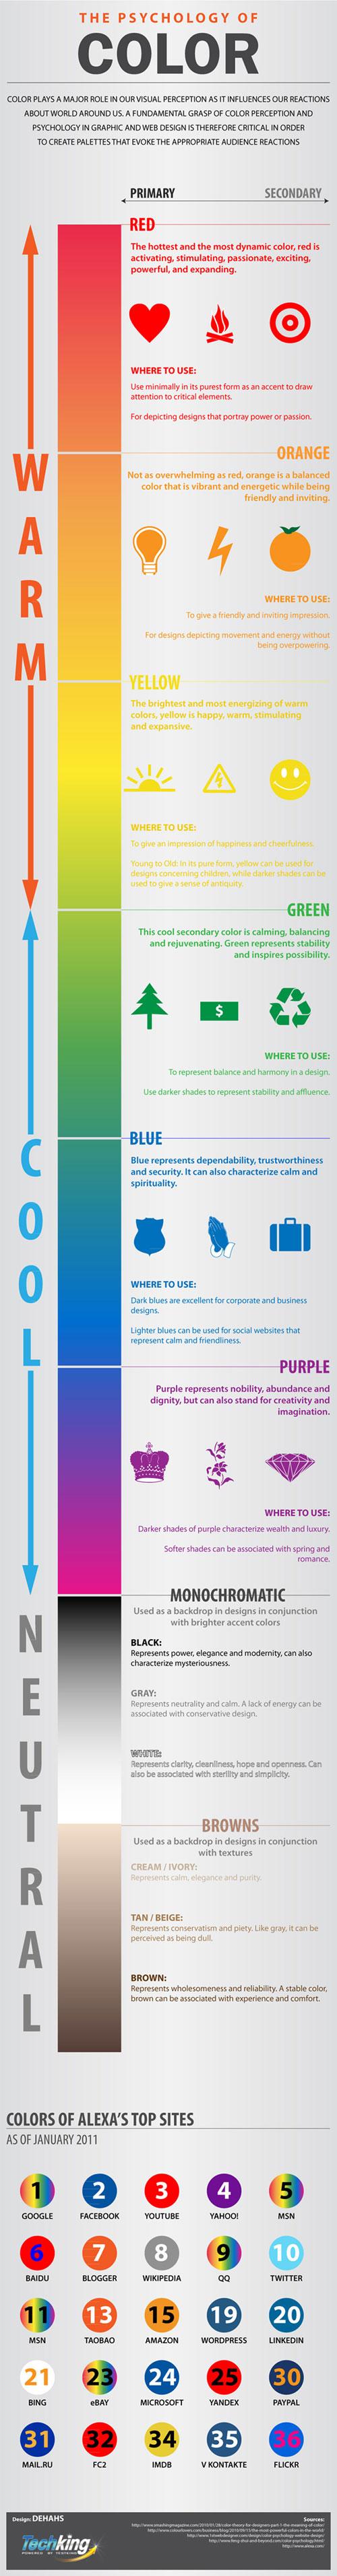 psychology-of-colour.jpg